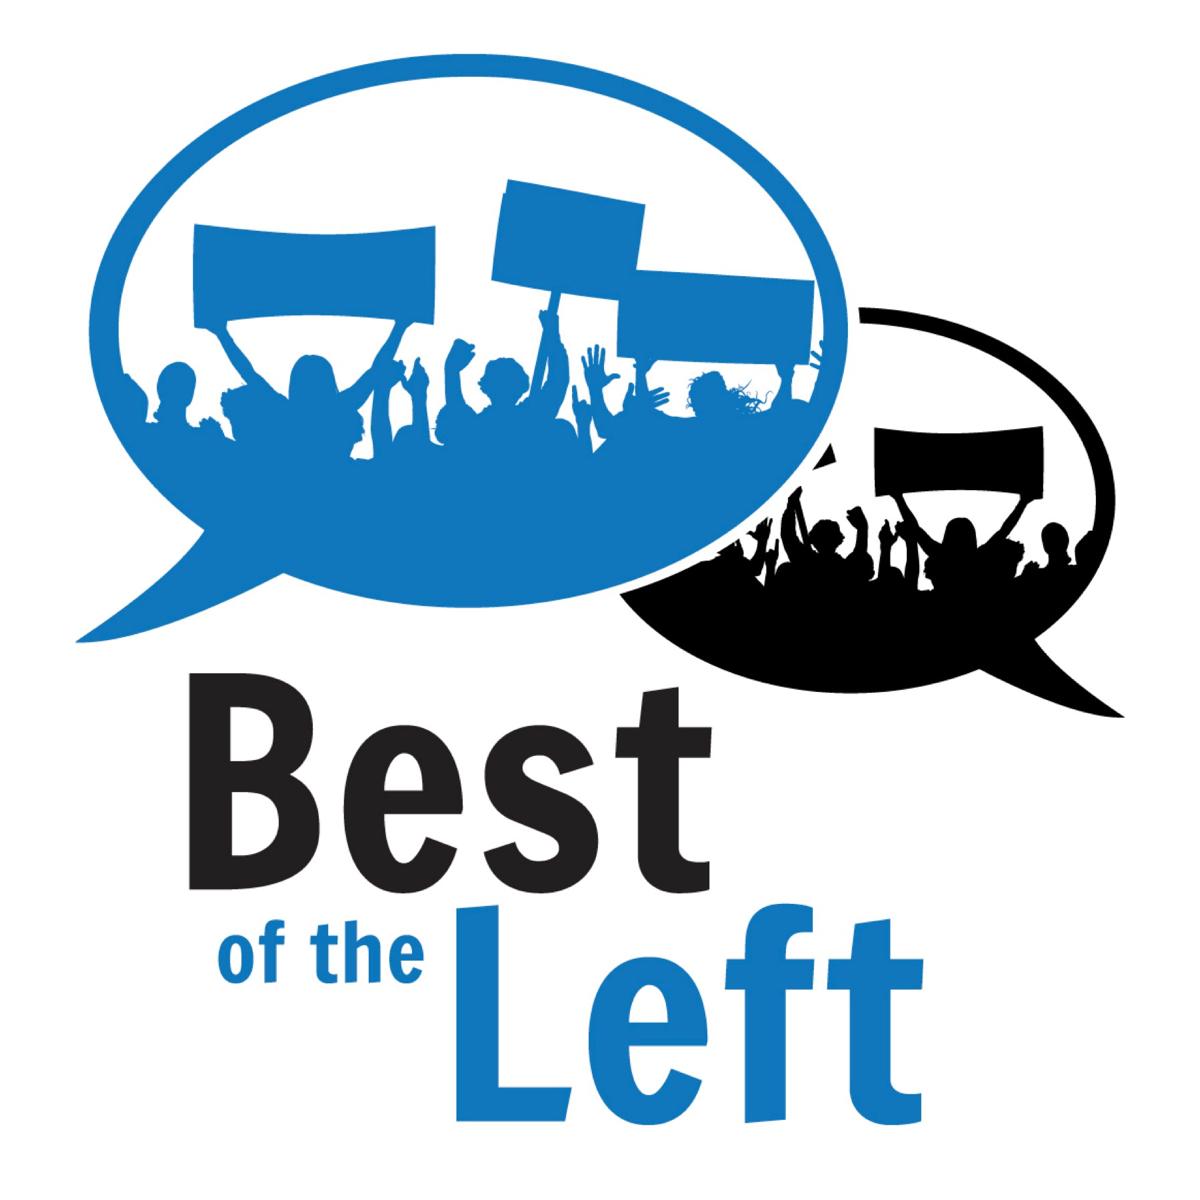 Best episodes of Best of the Left - The best of progressive